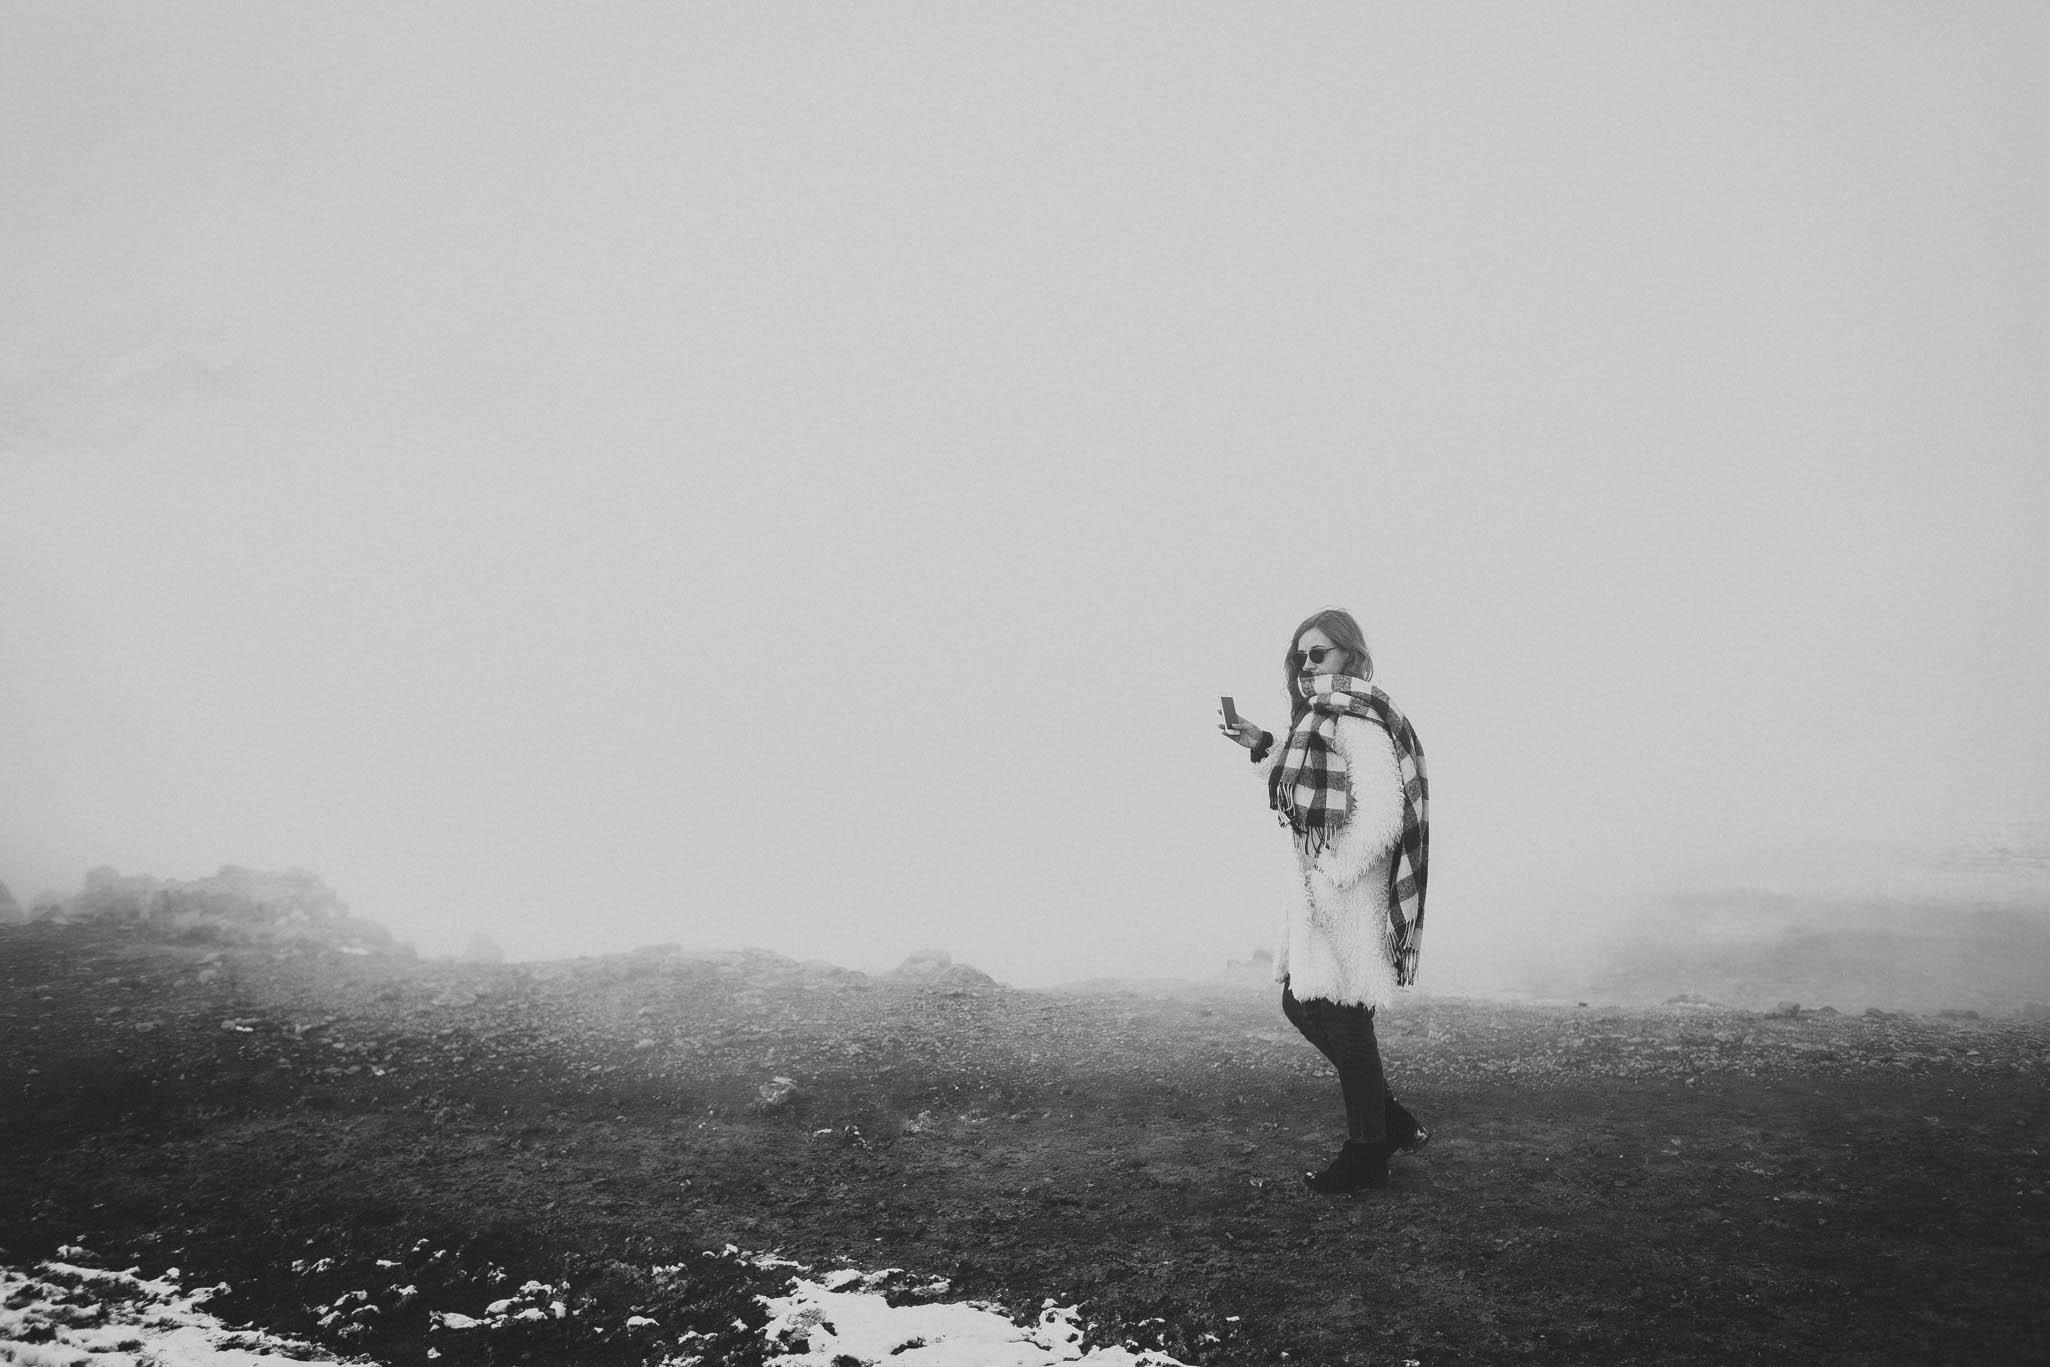 Road-trip-Islande-Iceland-Voyage-Travel-Portrait-Jérémy-Boyer-Hverir-Steam-mountains-montagnes-vapeur-15.jpg